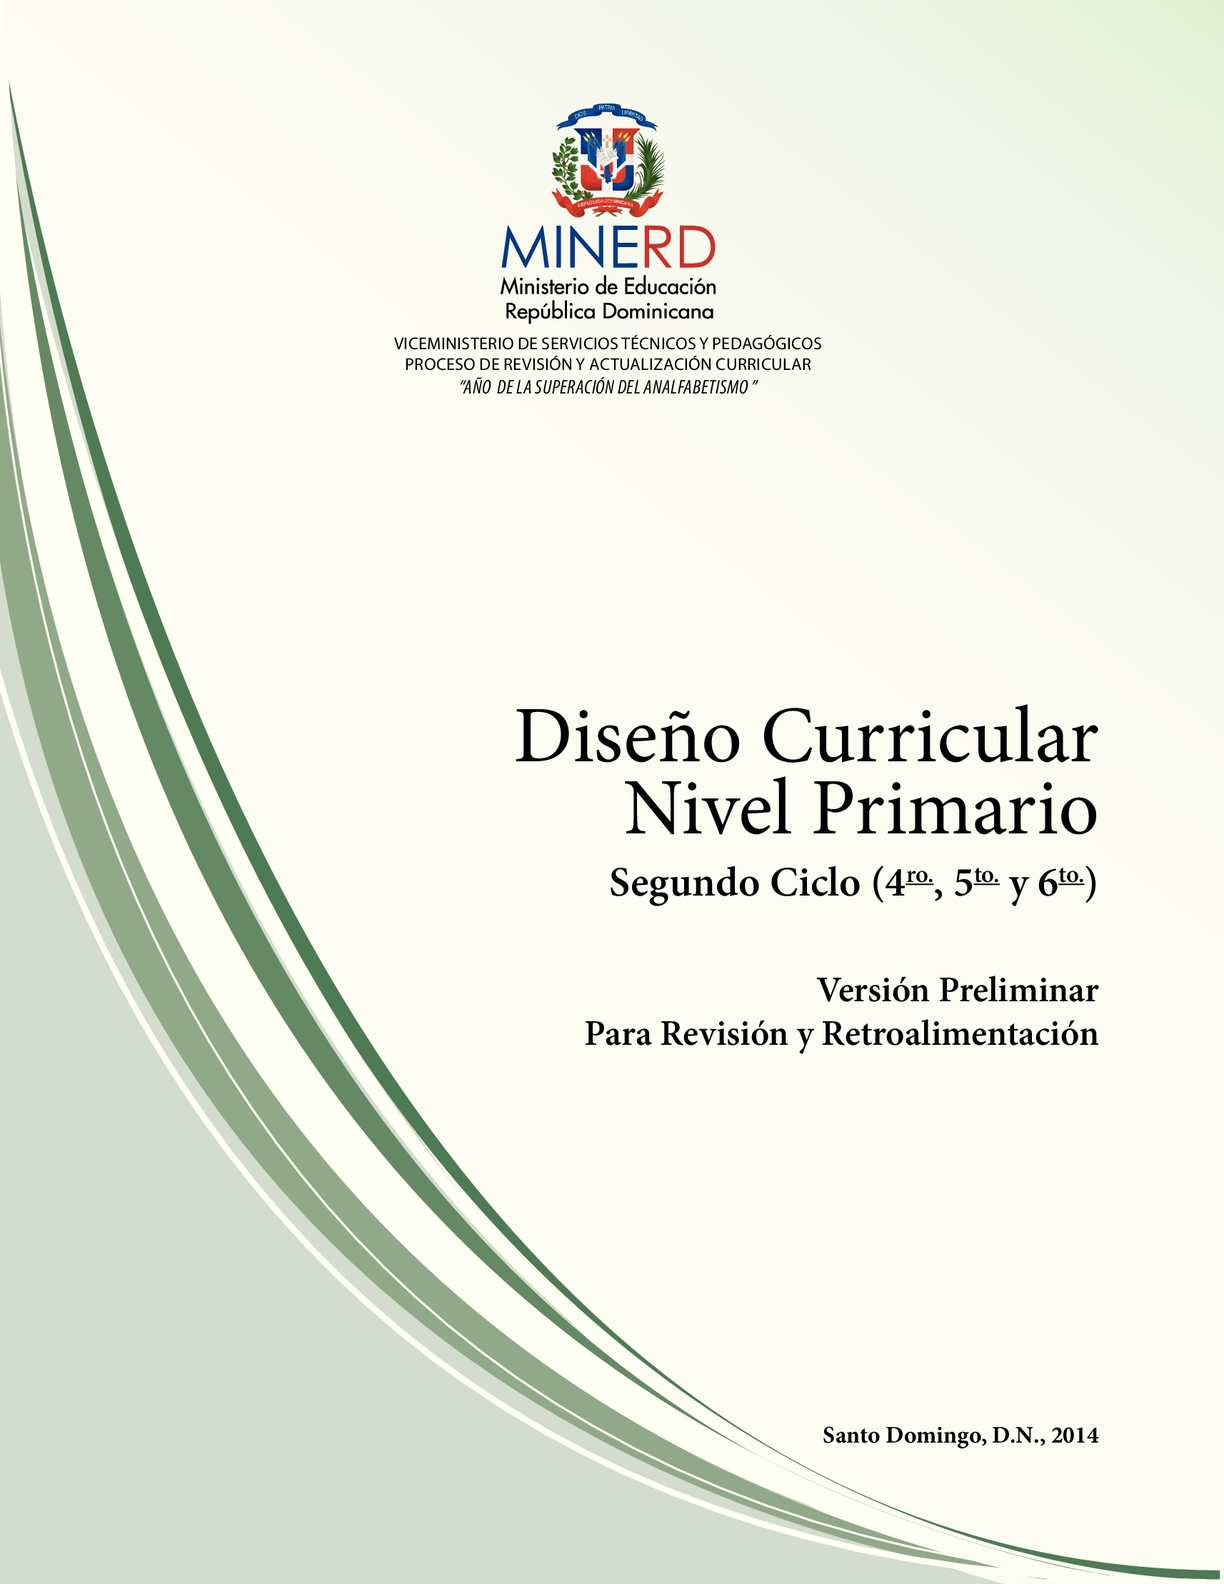 Calam o curriculo nivel primario segundo ciclo for Diseno curricular primaria